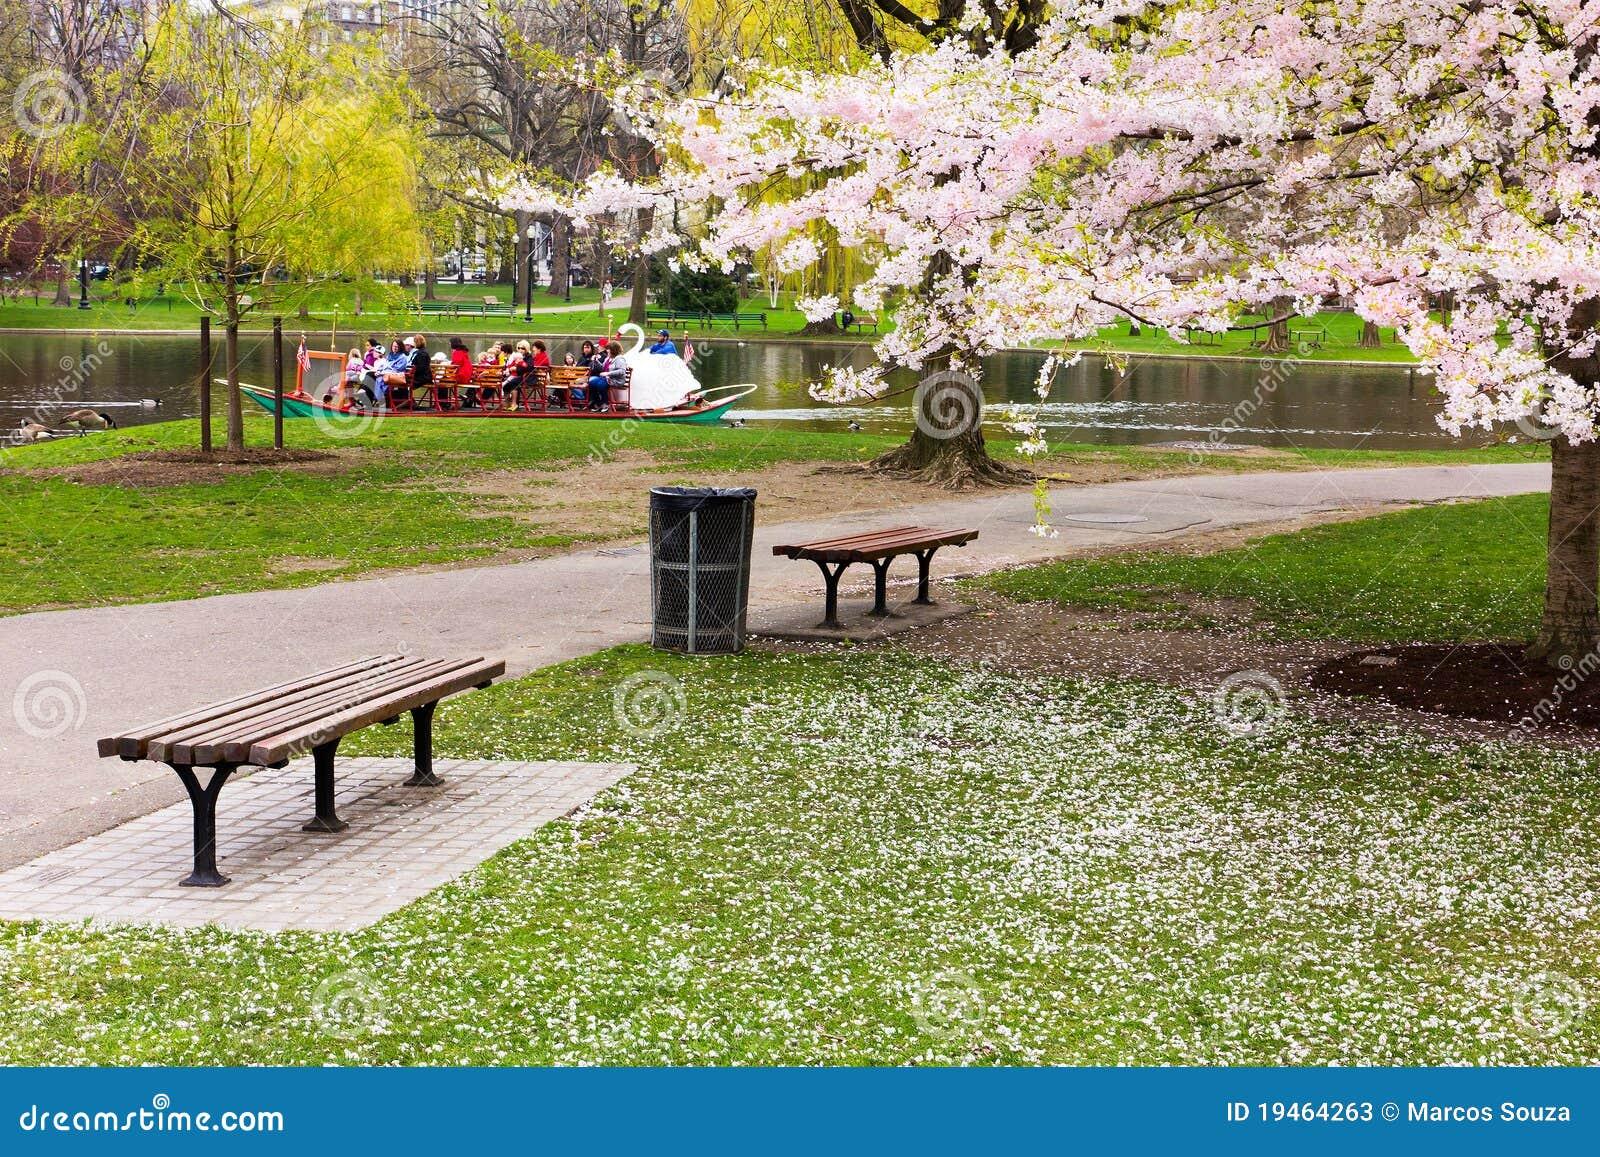 Jardin public de boston au printemps photo stock ditorial for Jardin public